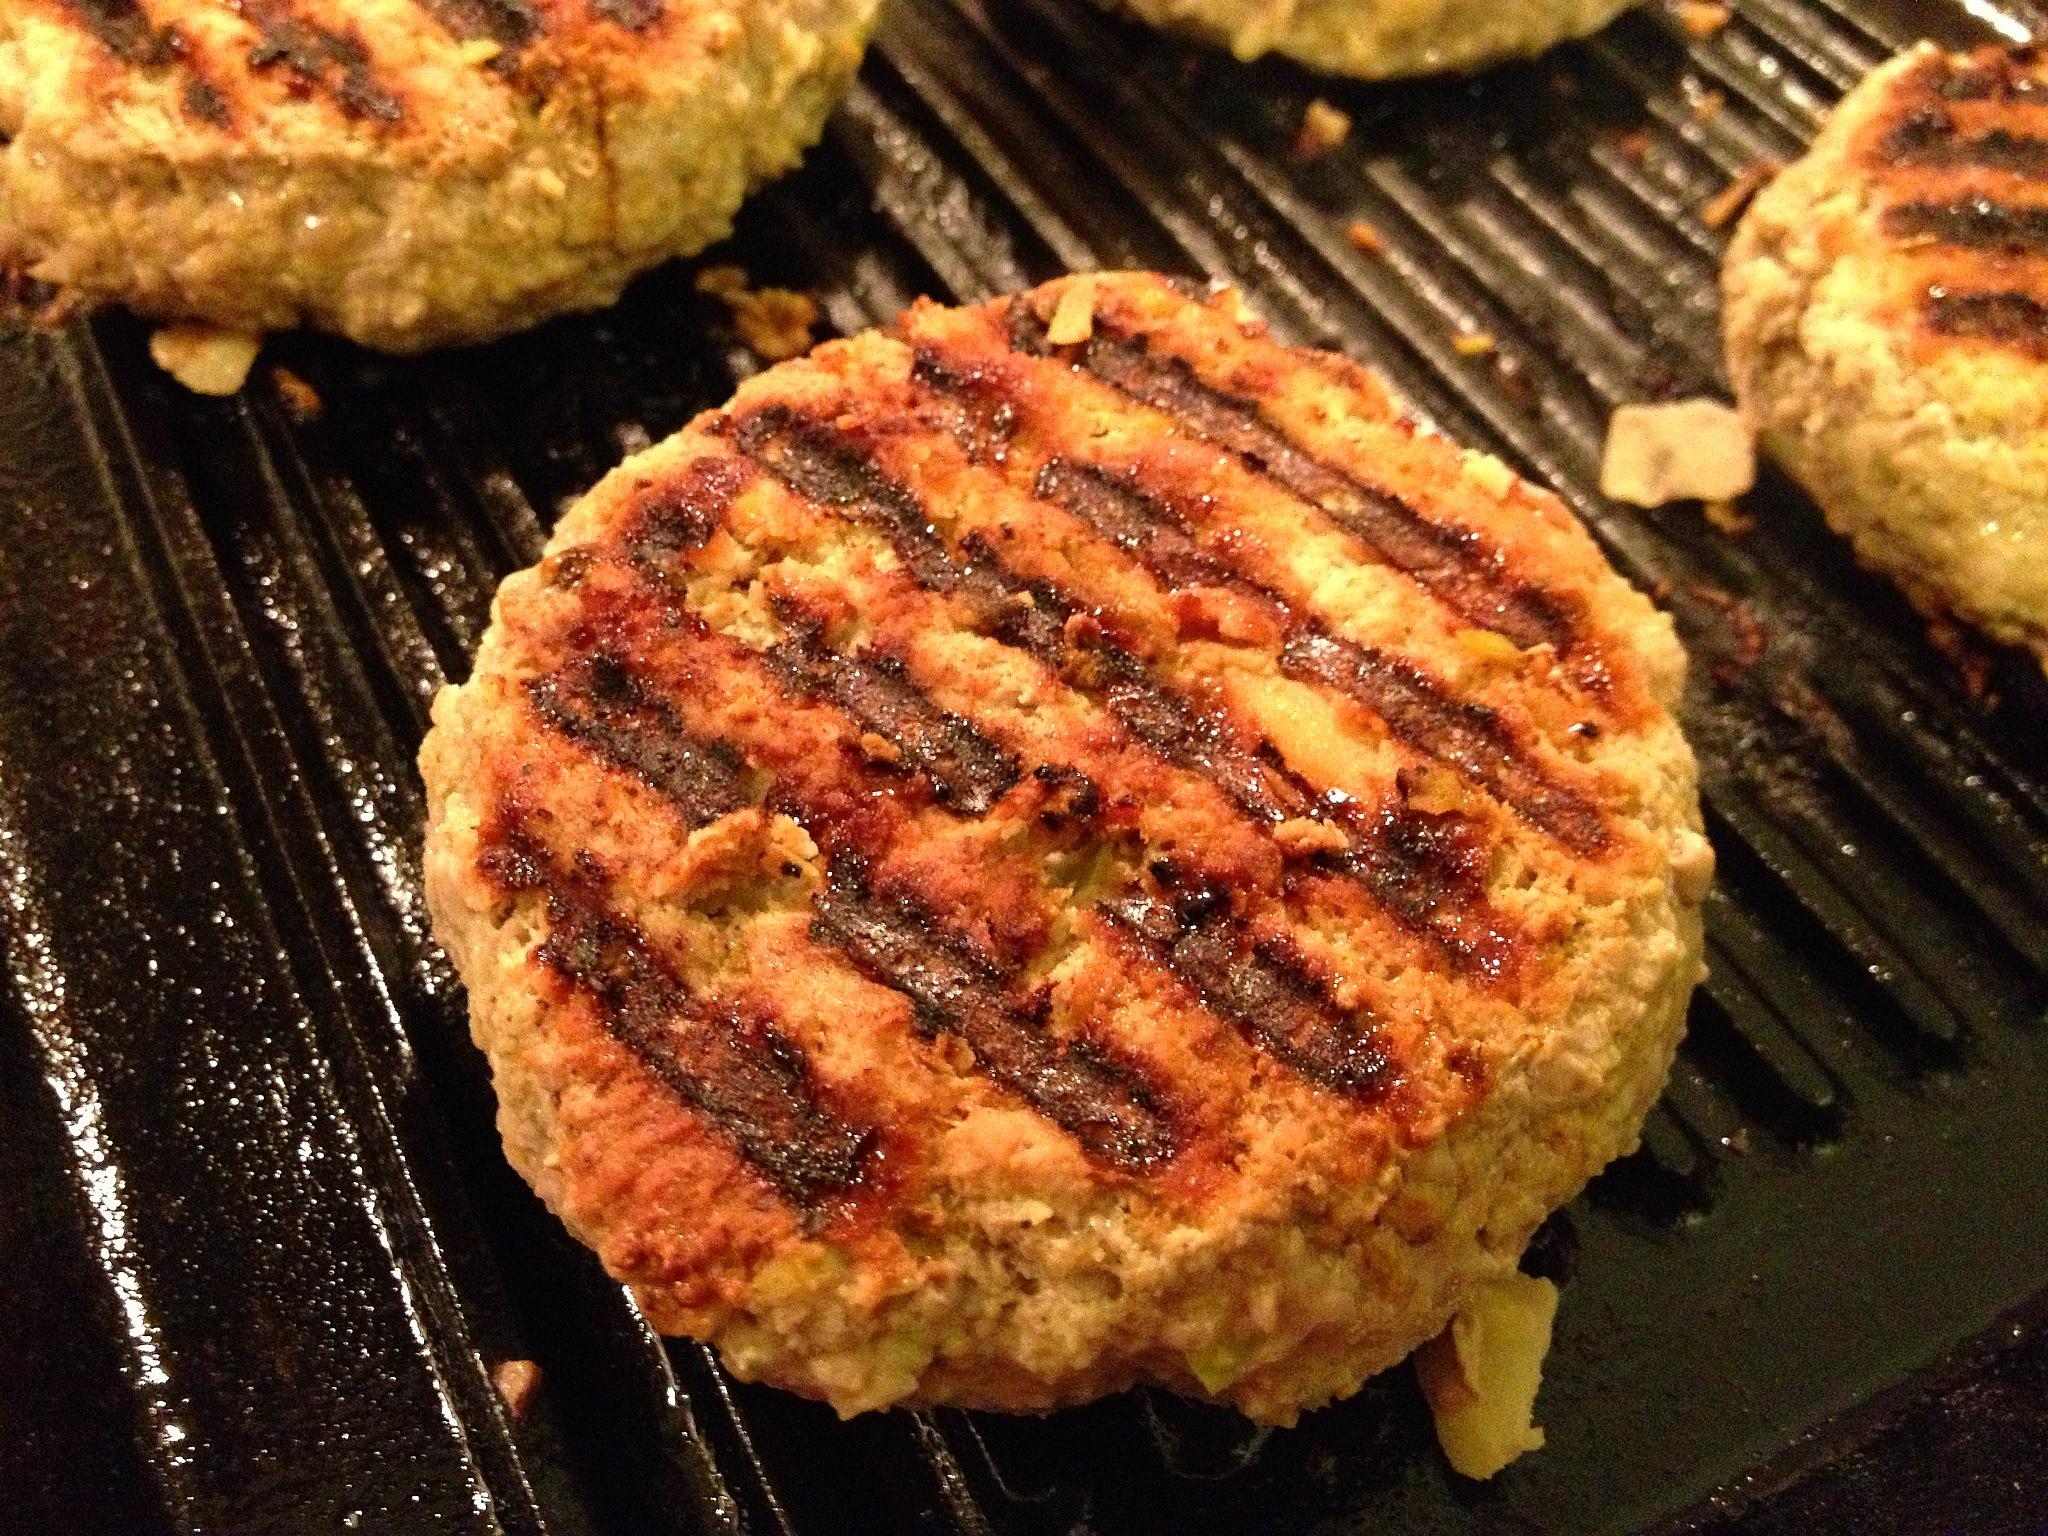 Grilled turkey burgers patties